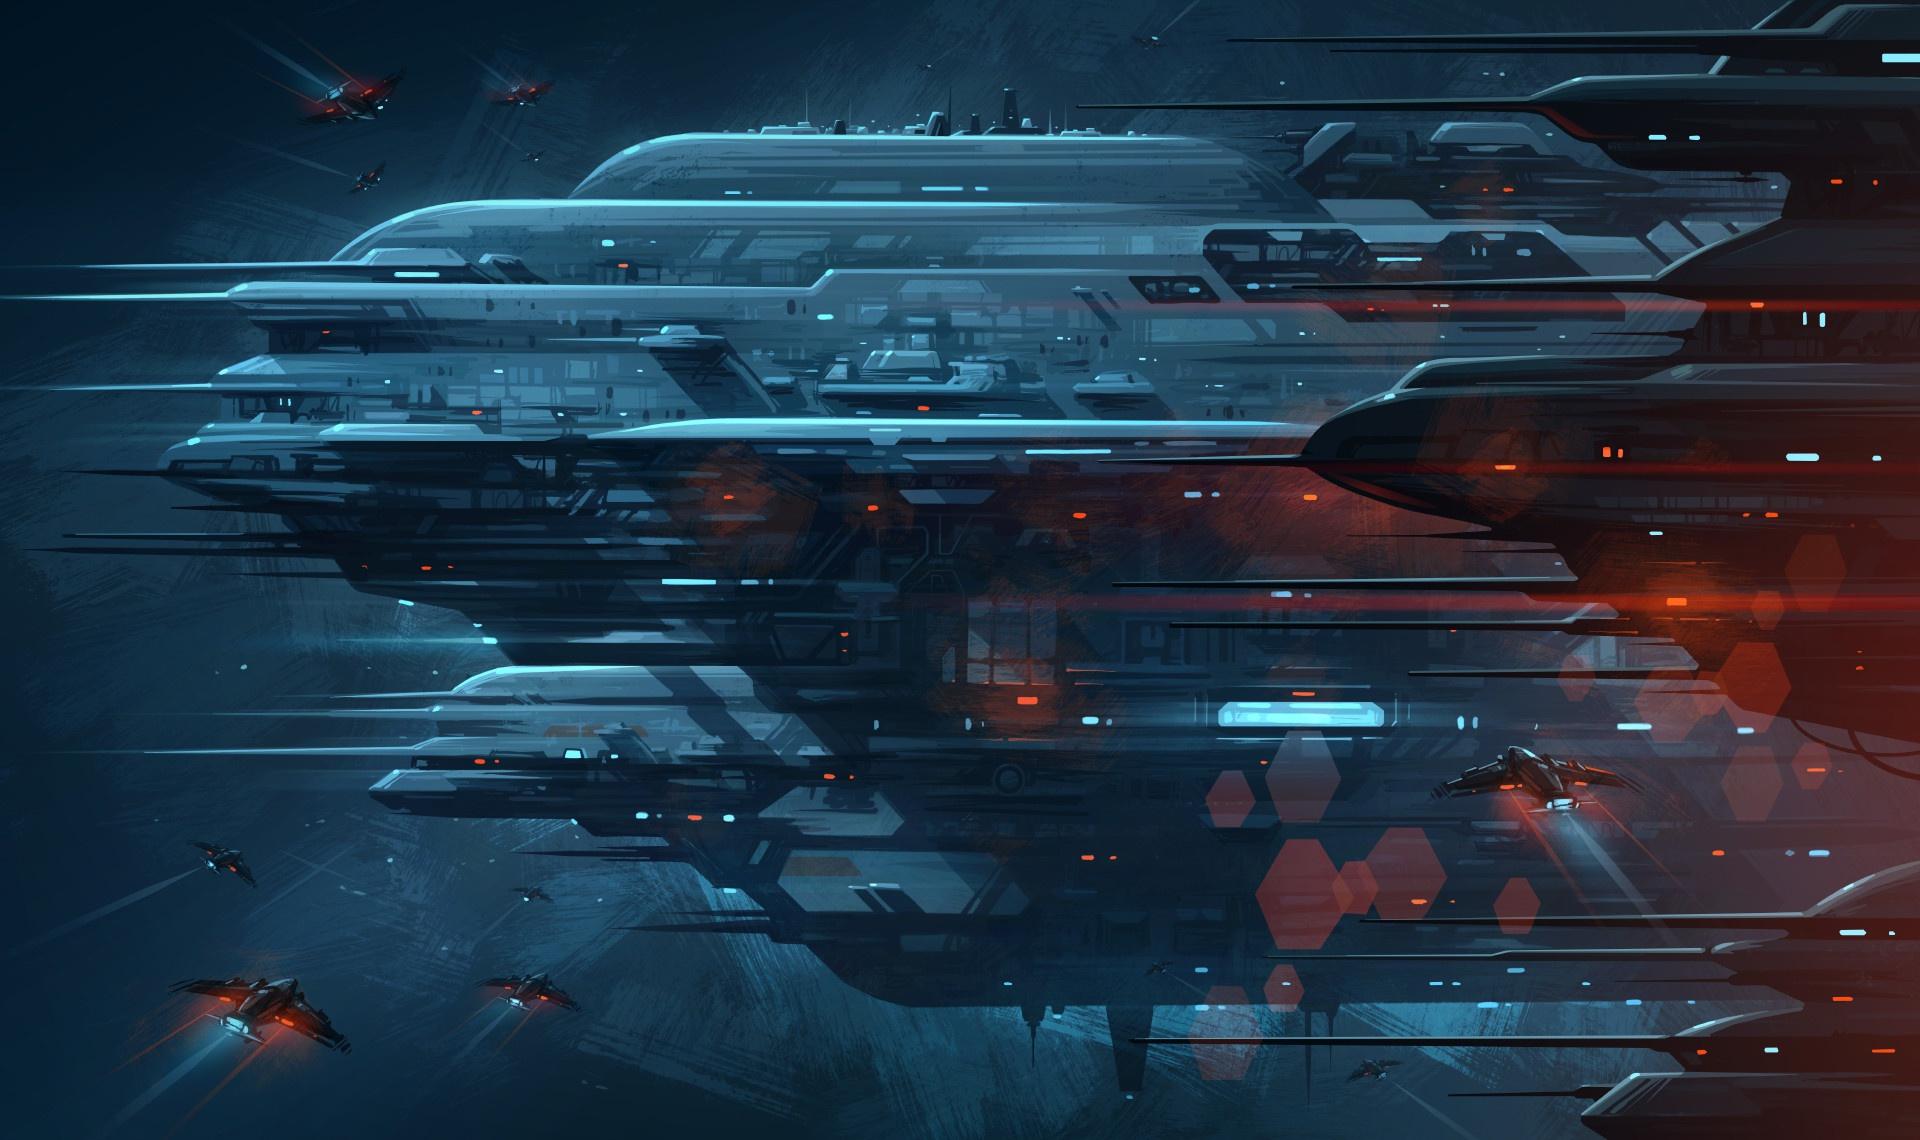 digital art spaceship science fiction space futuristic artwork